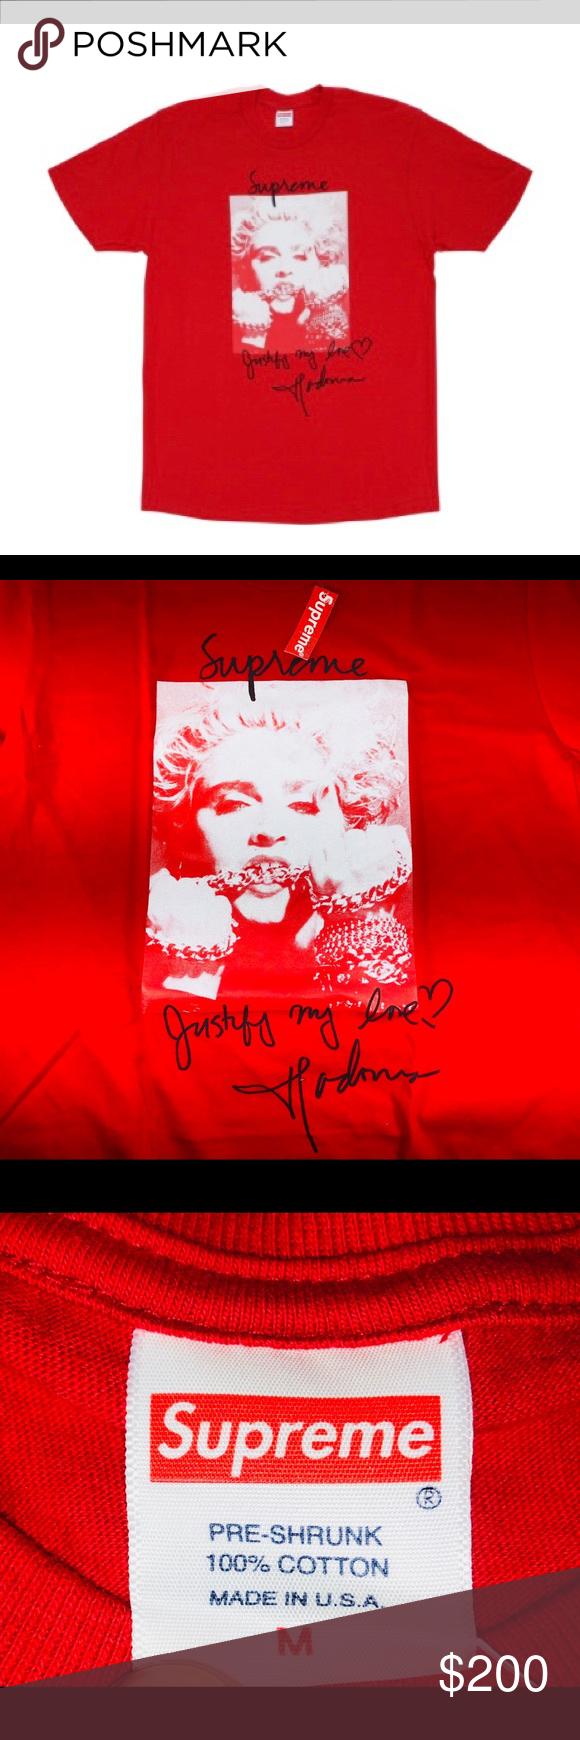 46917ab70 Supreme Madonna Tee Short Sleeve Graphic Tee Mens Size Medium FW18 T1  Supreme Shirts Tees - Short Sleeve